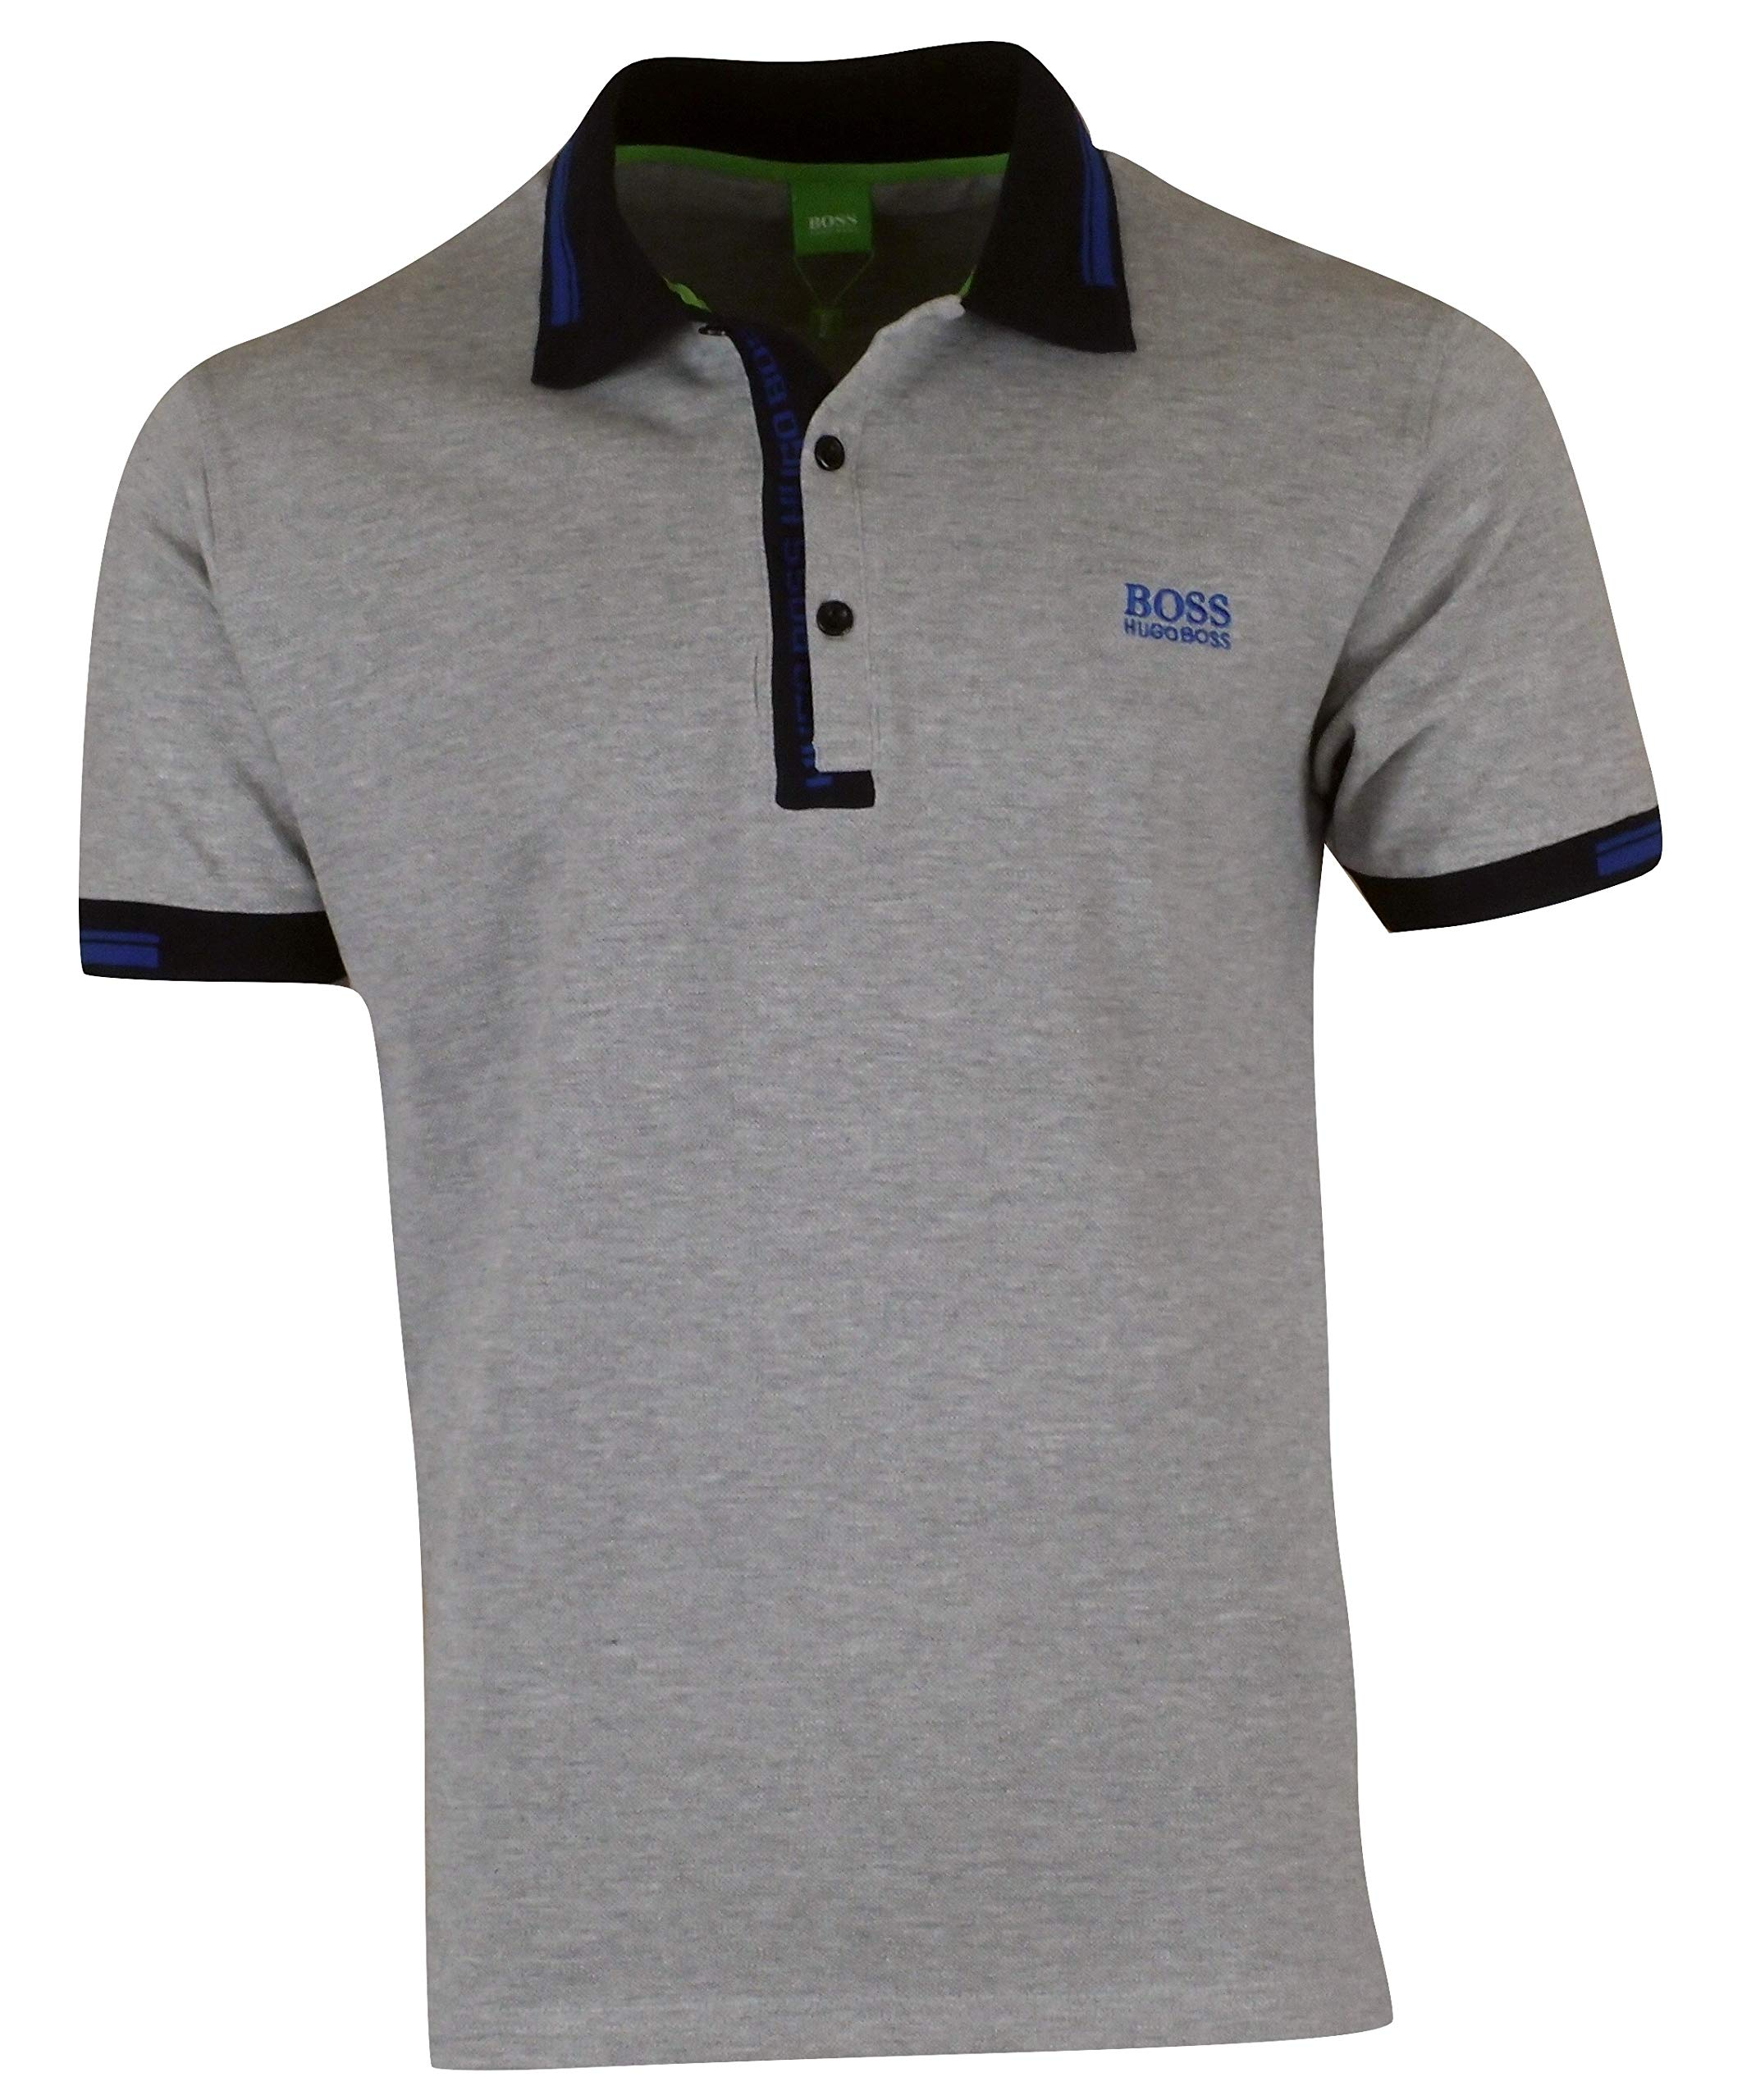 Hugo Boss Men's Paule 4 Blue Logo Collar Detail Short Sleeve Slim Fit Polo Shirt - Gray (Medium)